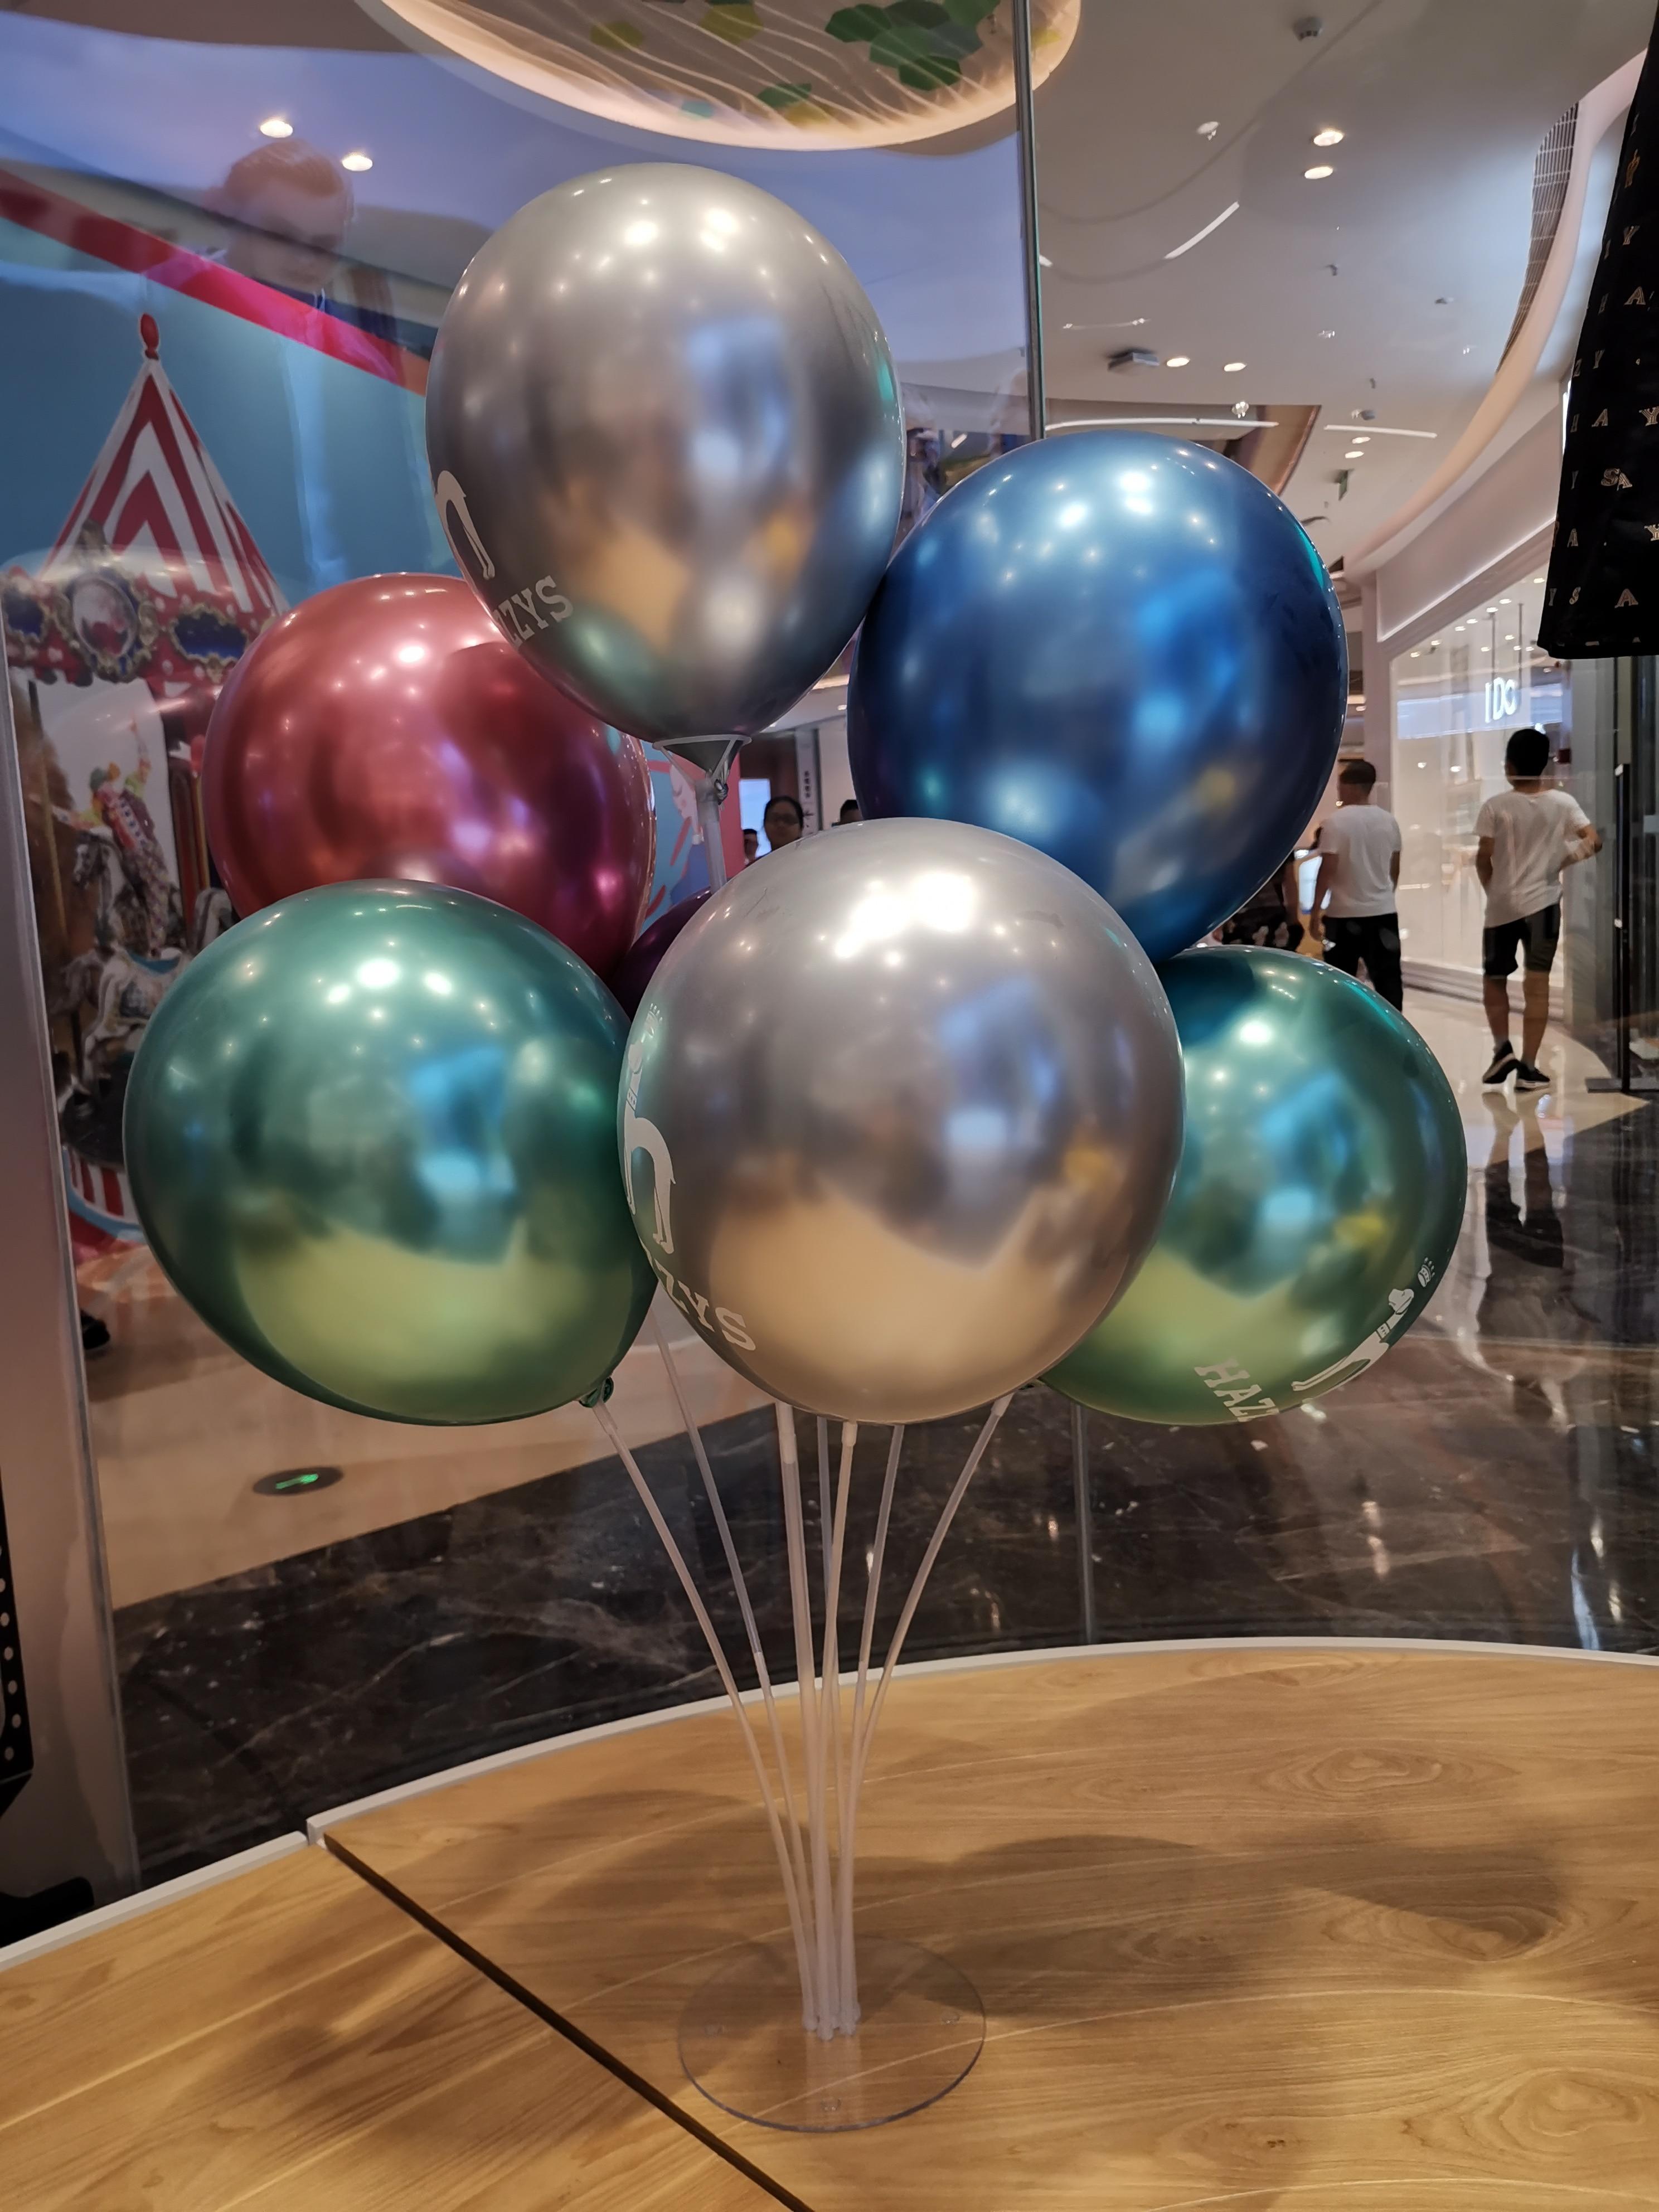 10/20/30pcs Metallic Latex Helium Balloon Birthday Parties Decorations Adult Decor Anniversaire Wedding Party Supplies Ballon